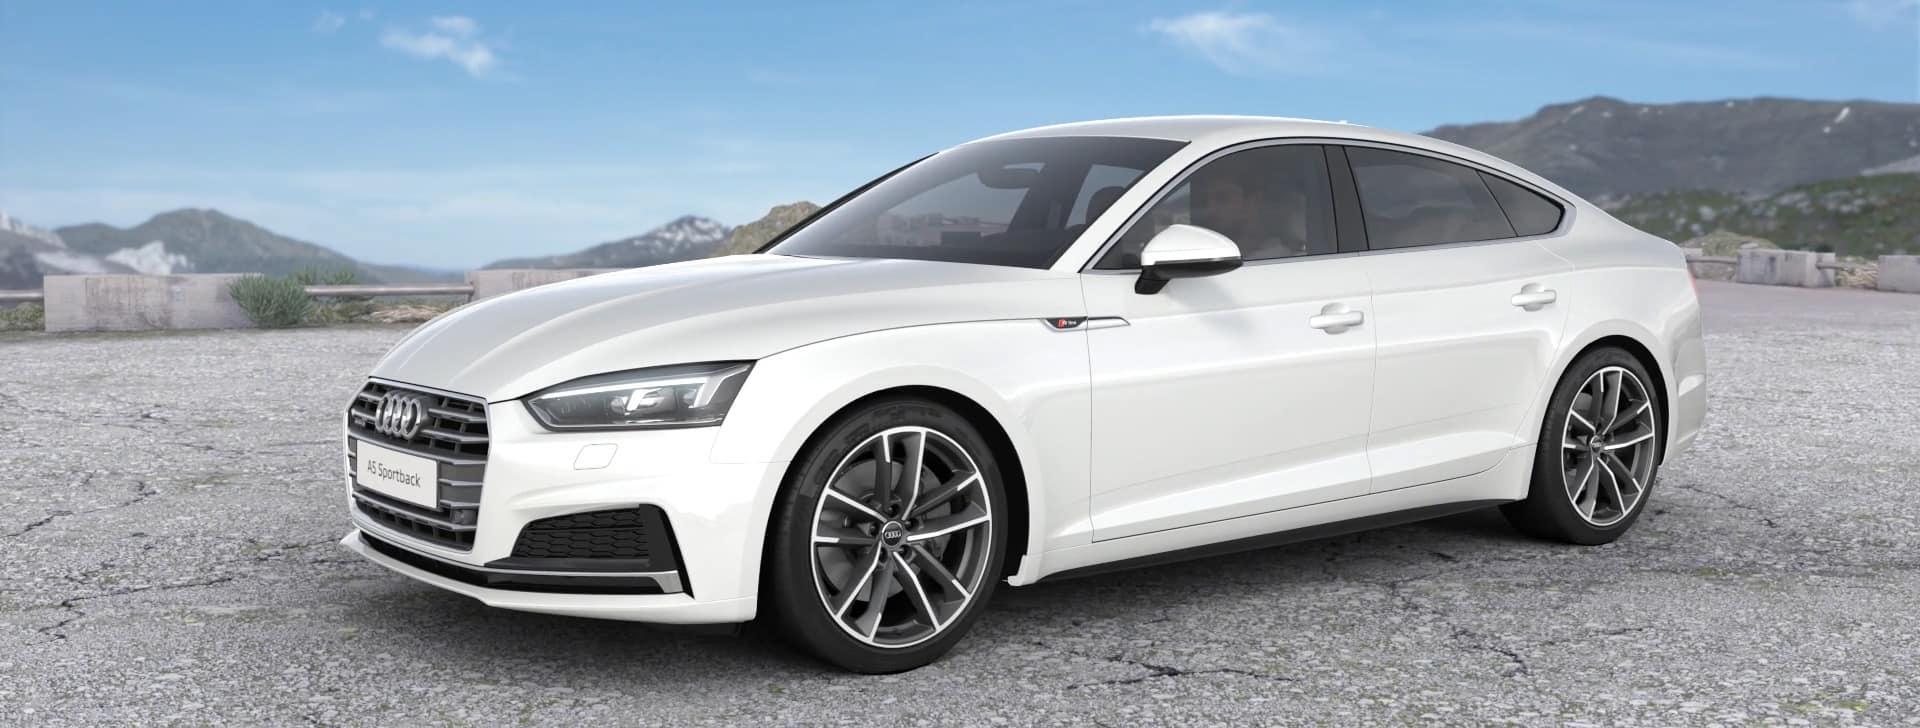 A5 Sportback 2018 A5 Audi Deutschland